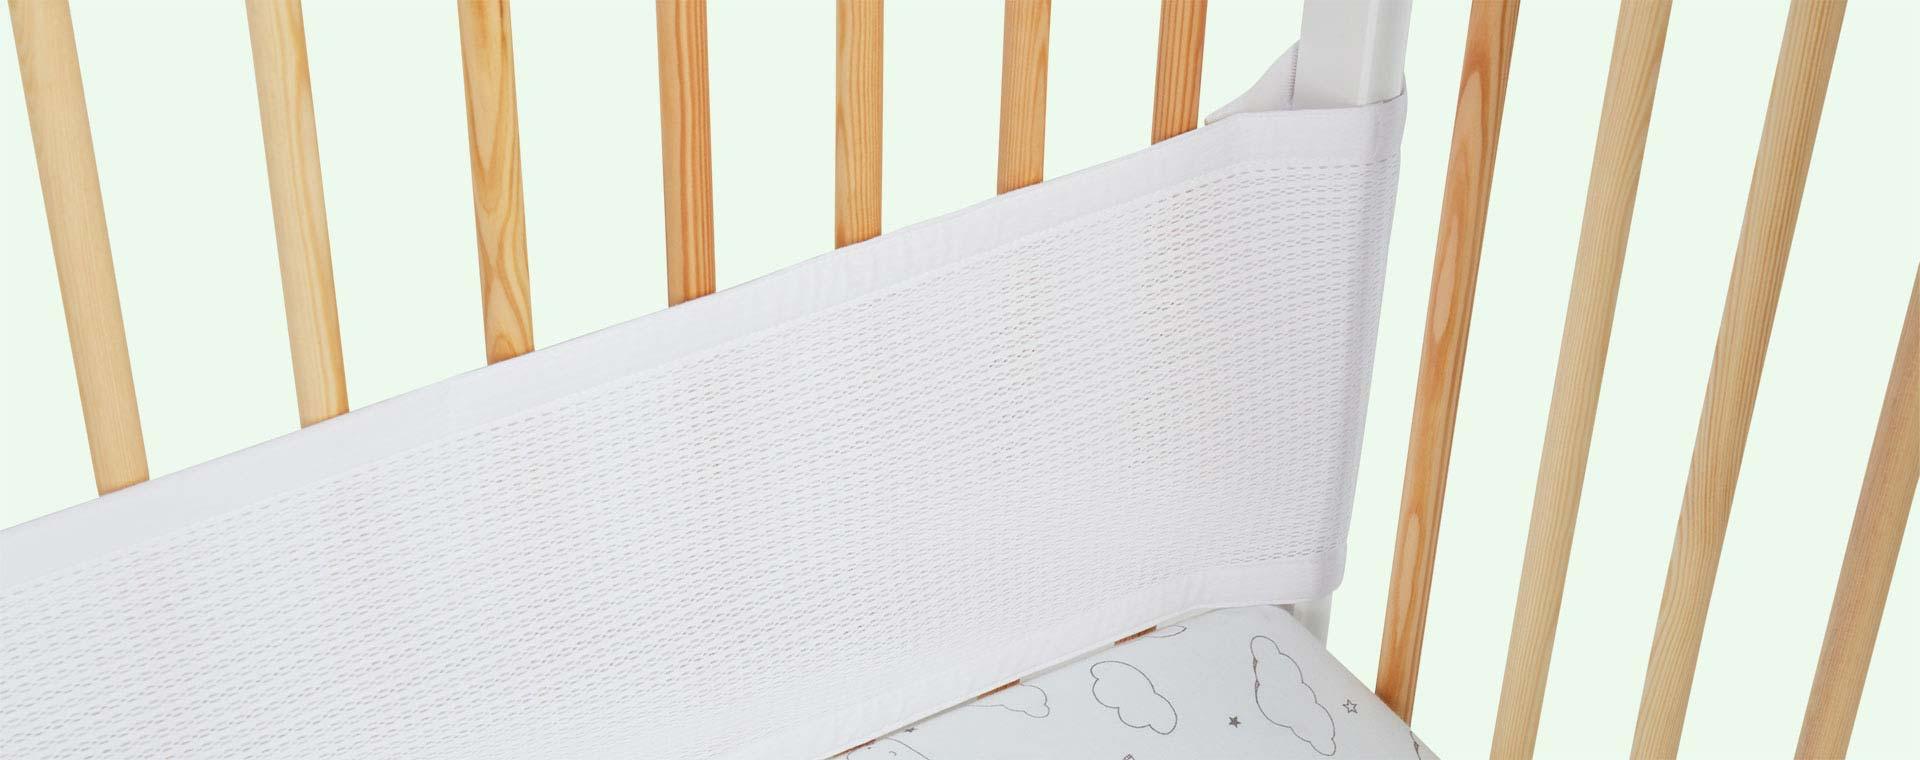 White babybundle Safe Dreams 2 sided Cotwrap Bumper